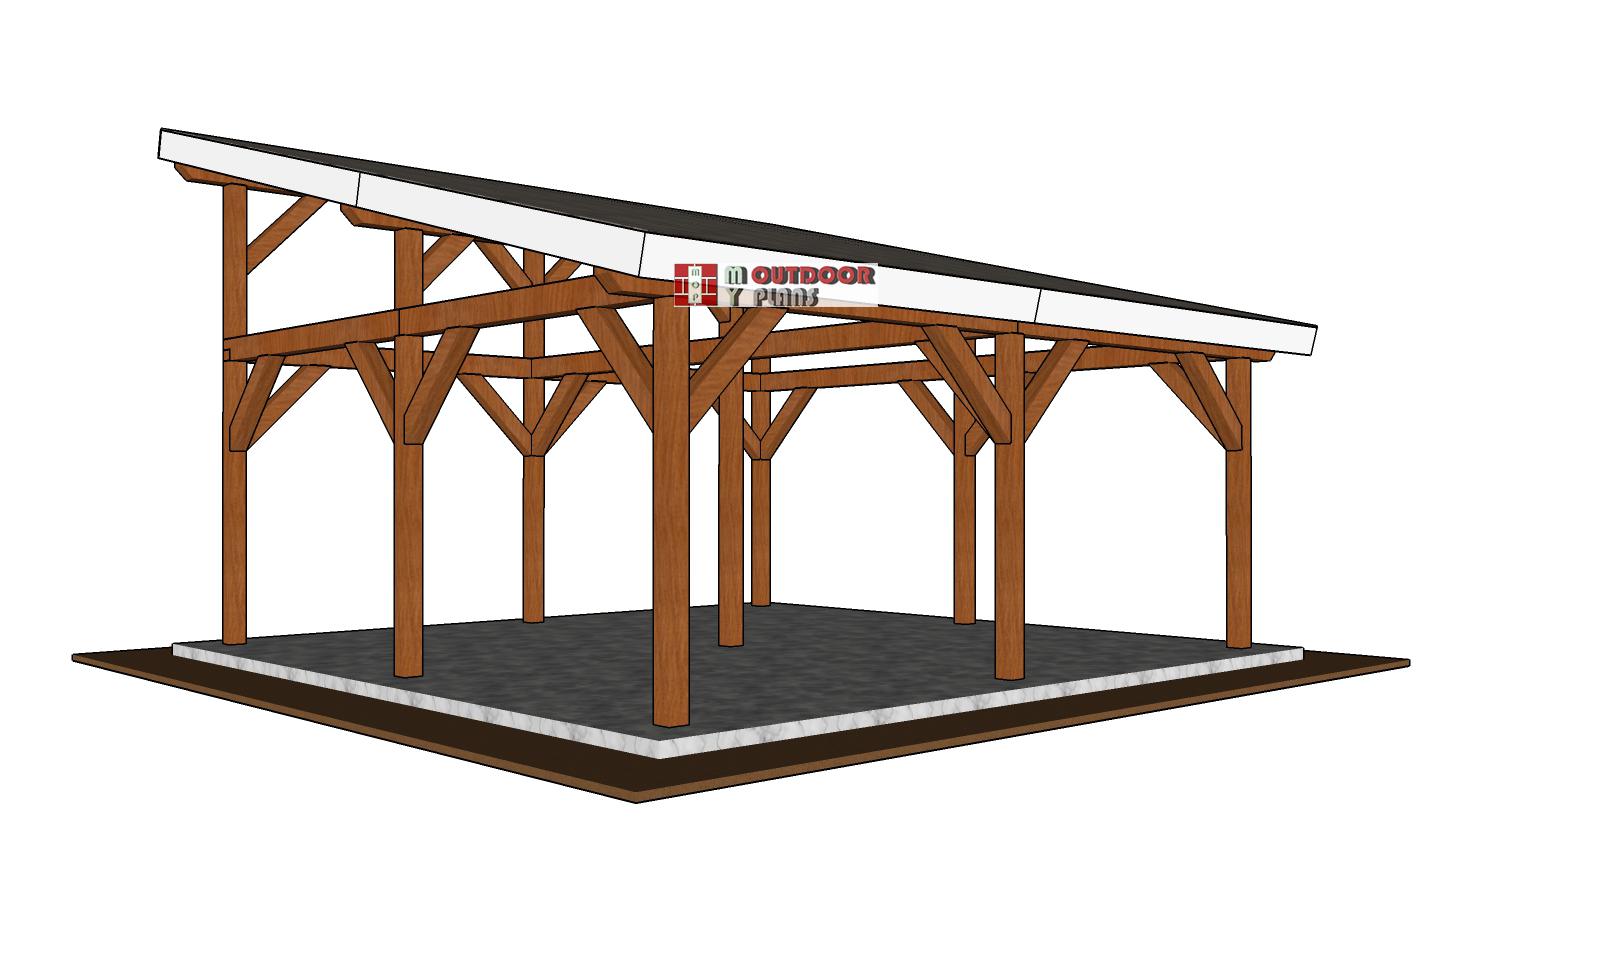 20x20 Lean to Pavilion - Free DIY Plans